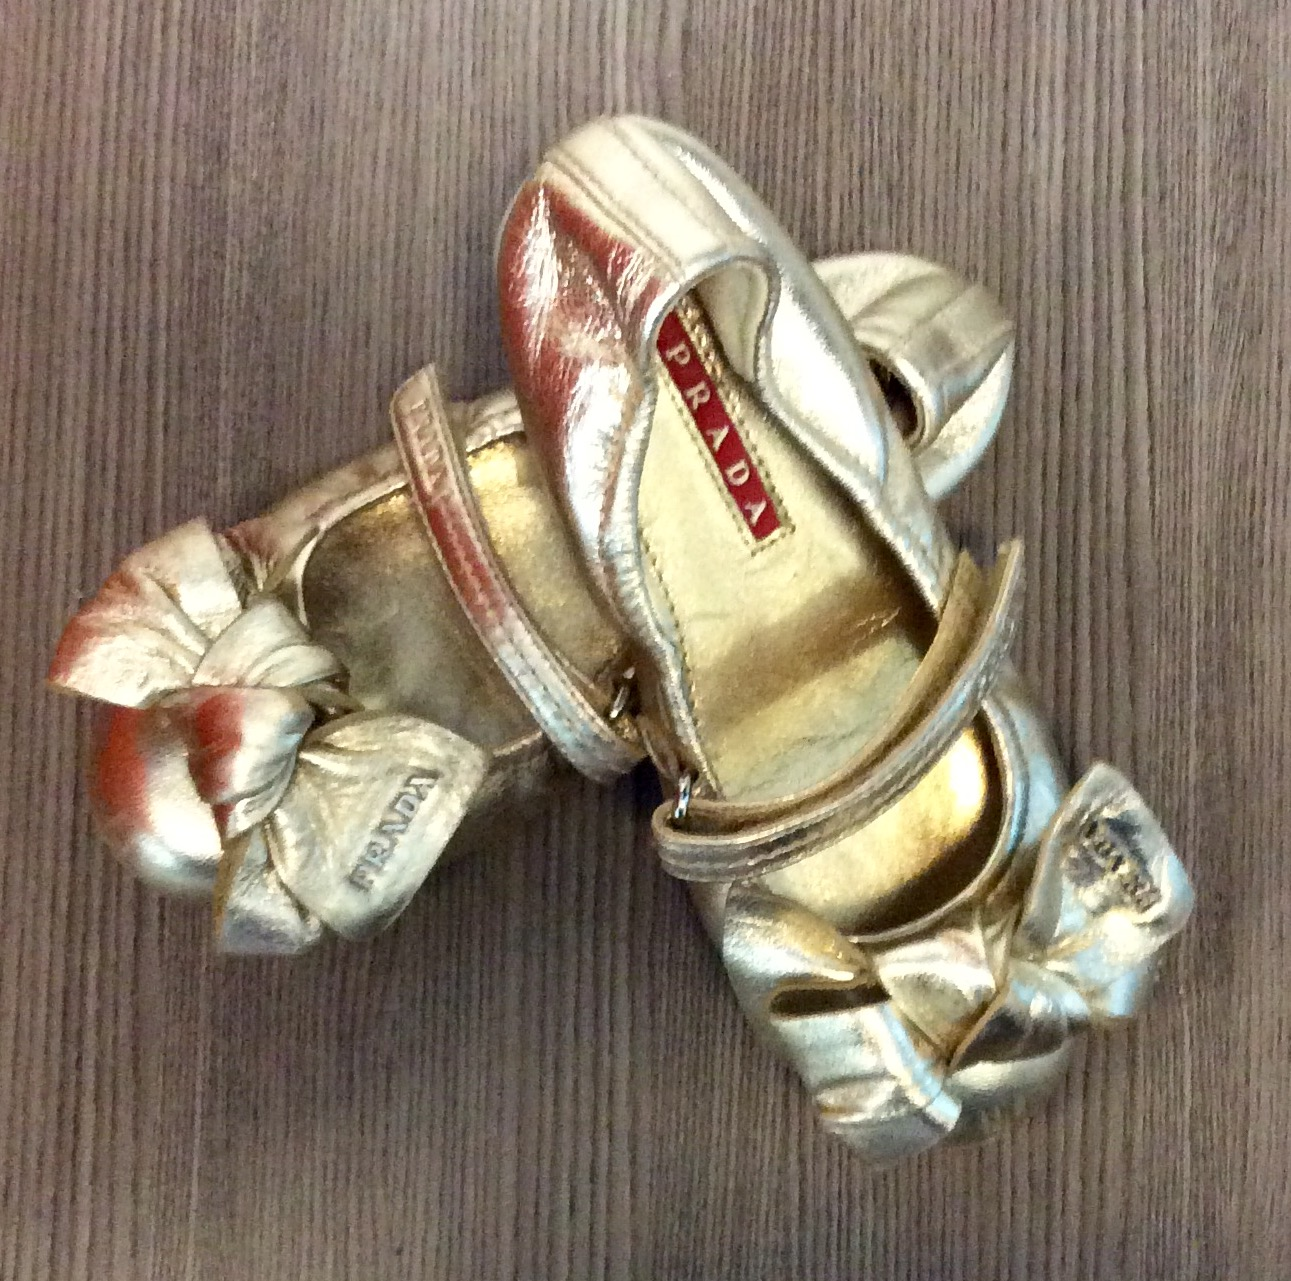 Prada-Size-28-Gold-Shoes_1514A.jpg